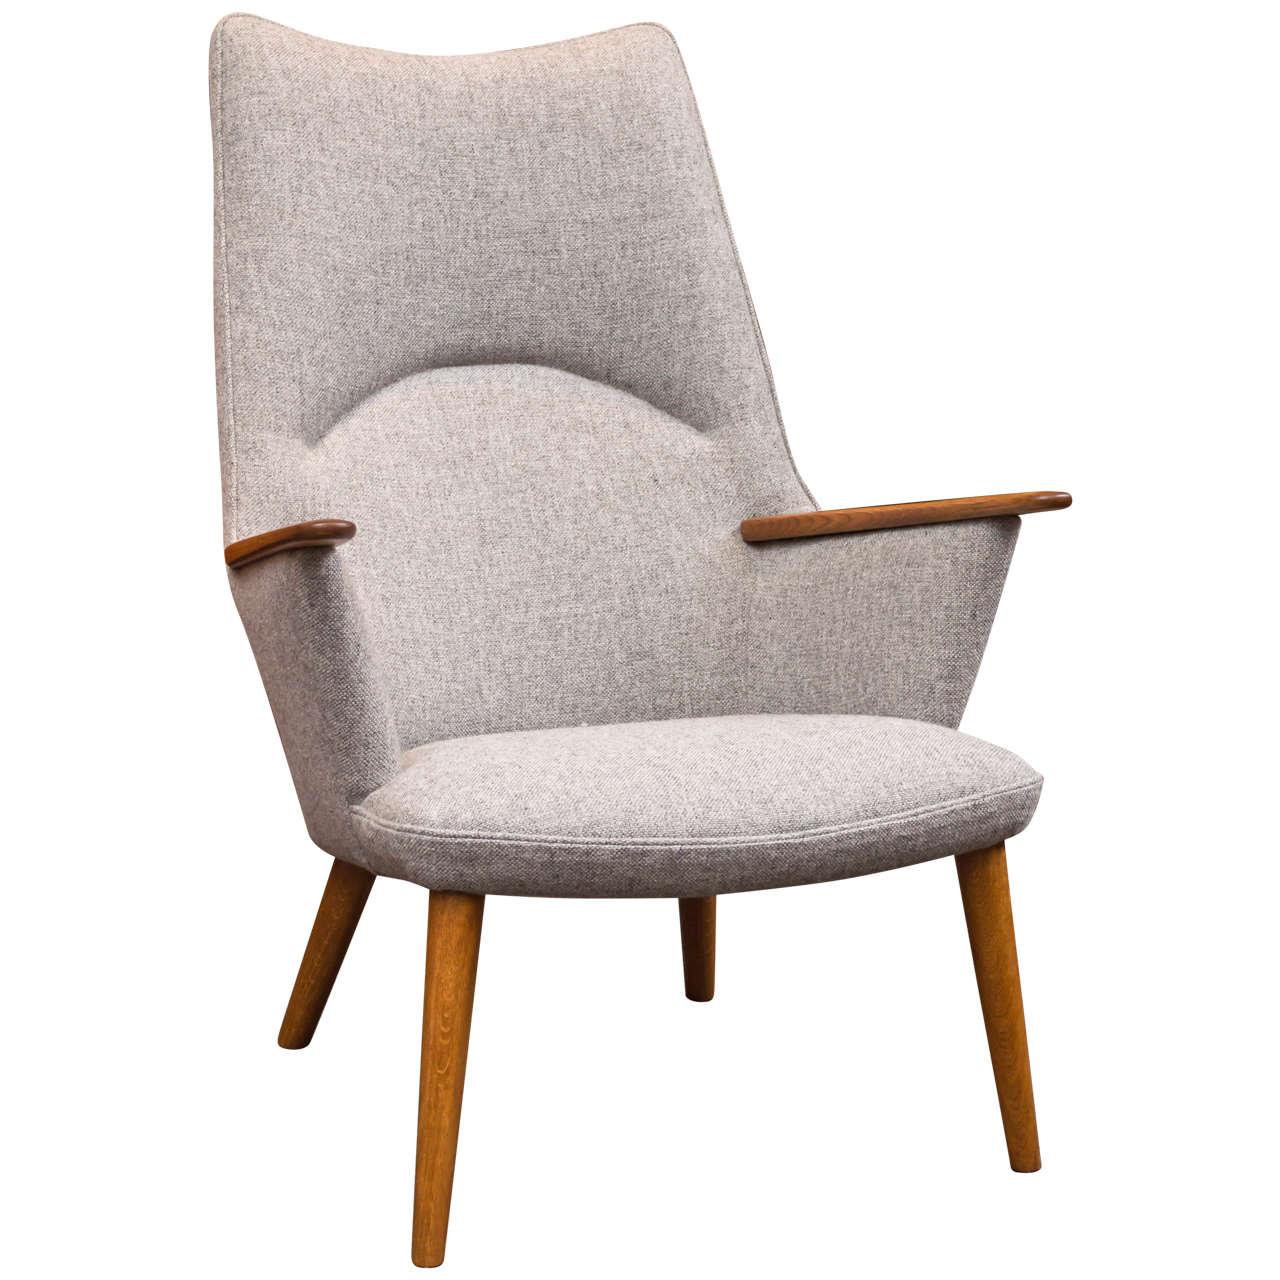 Hans Wegner AP 27 Lounge Chair For Sale